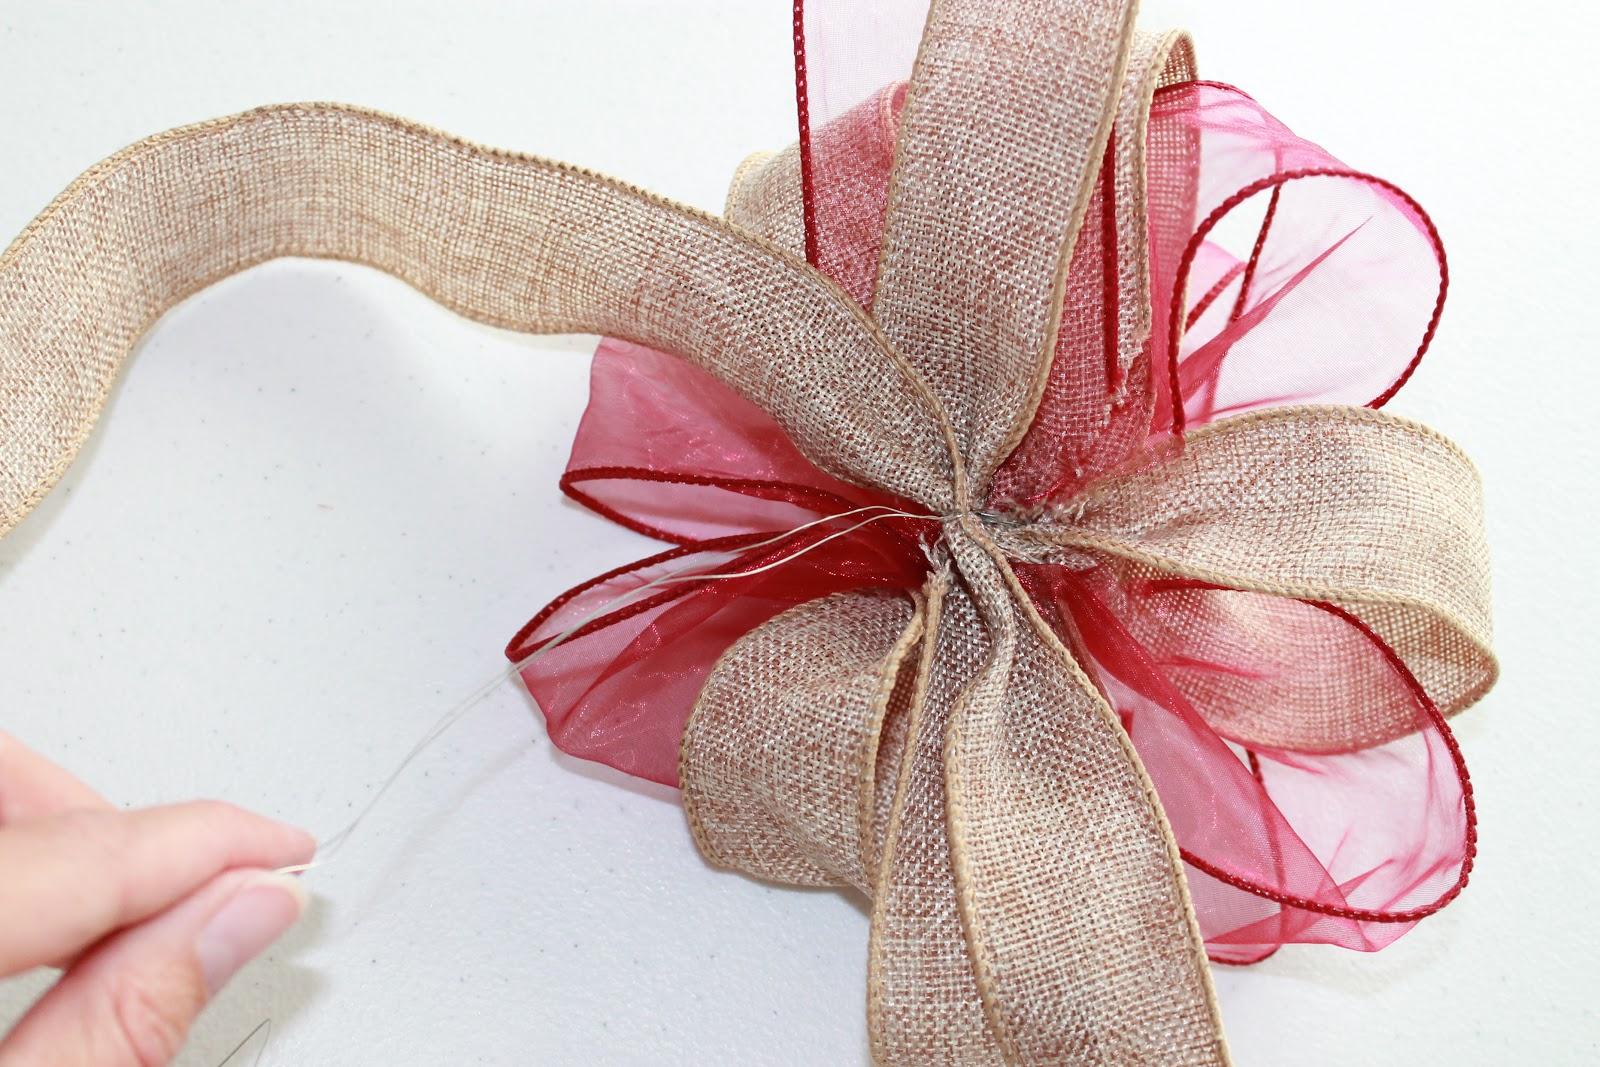 Embroitique How To Make Big Decorative Bows A